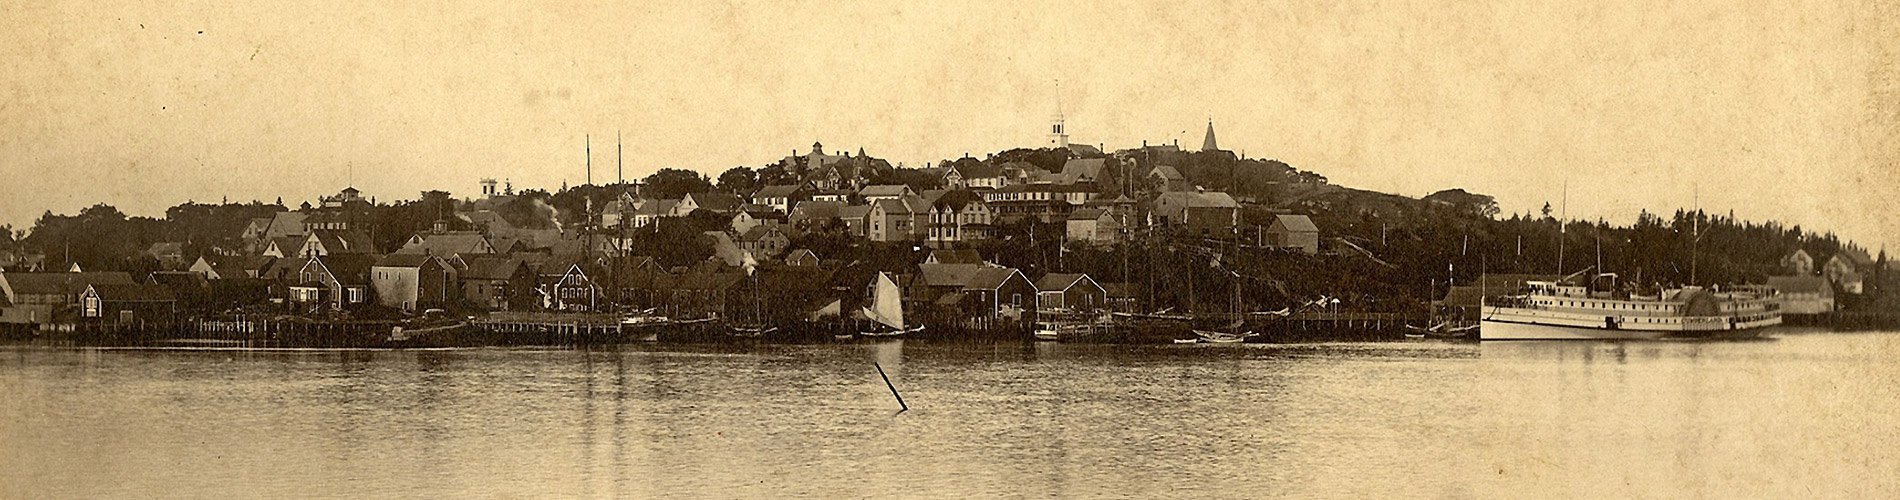 historic-photograph